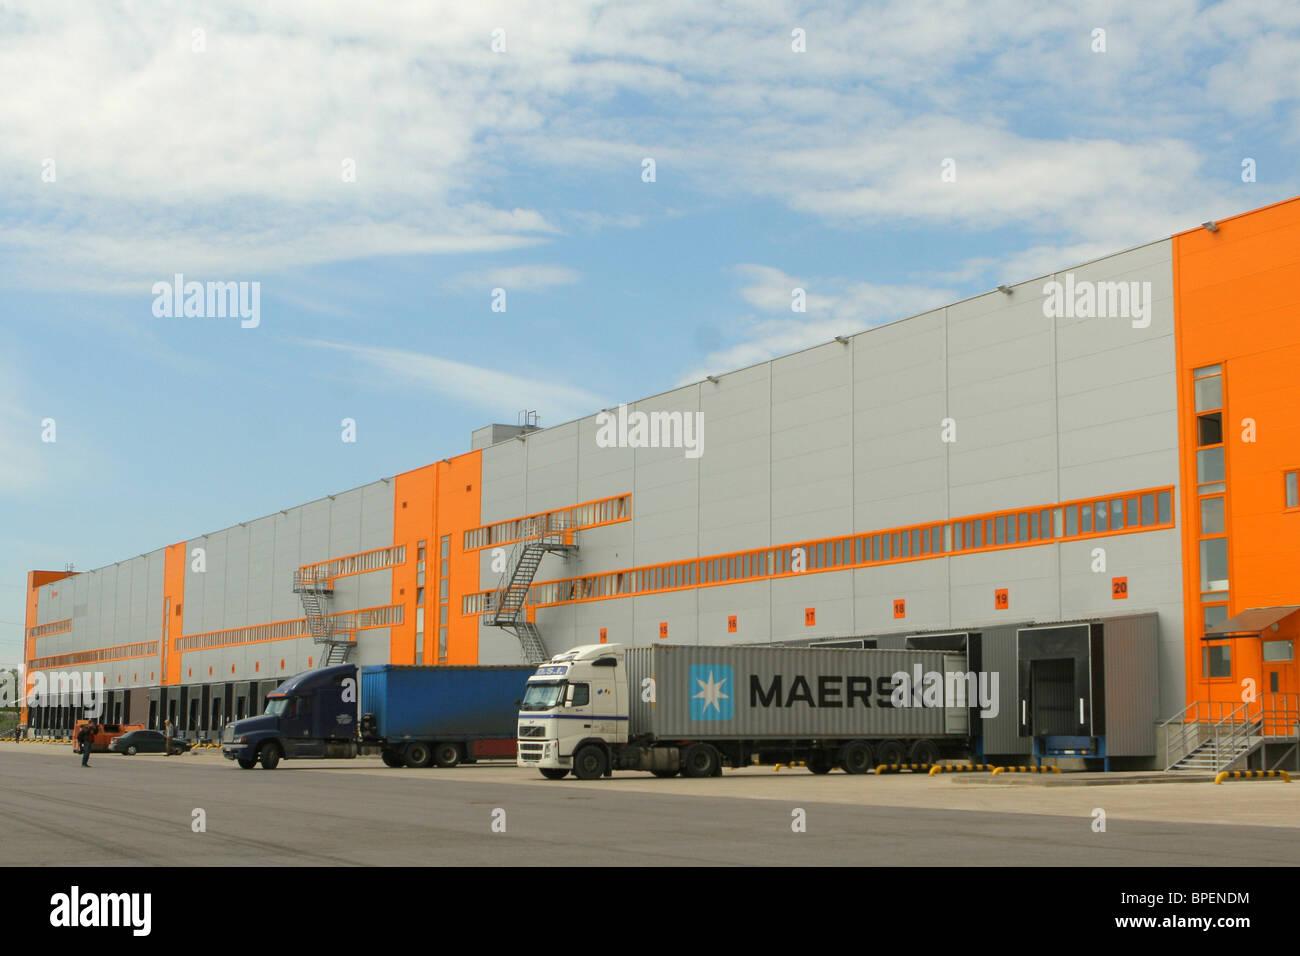 National Logistics Company Relogix's warehouse facility in Leningrad